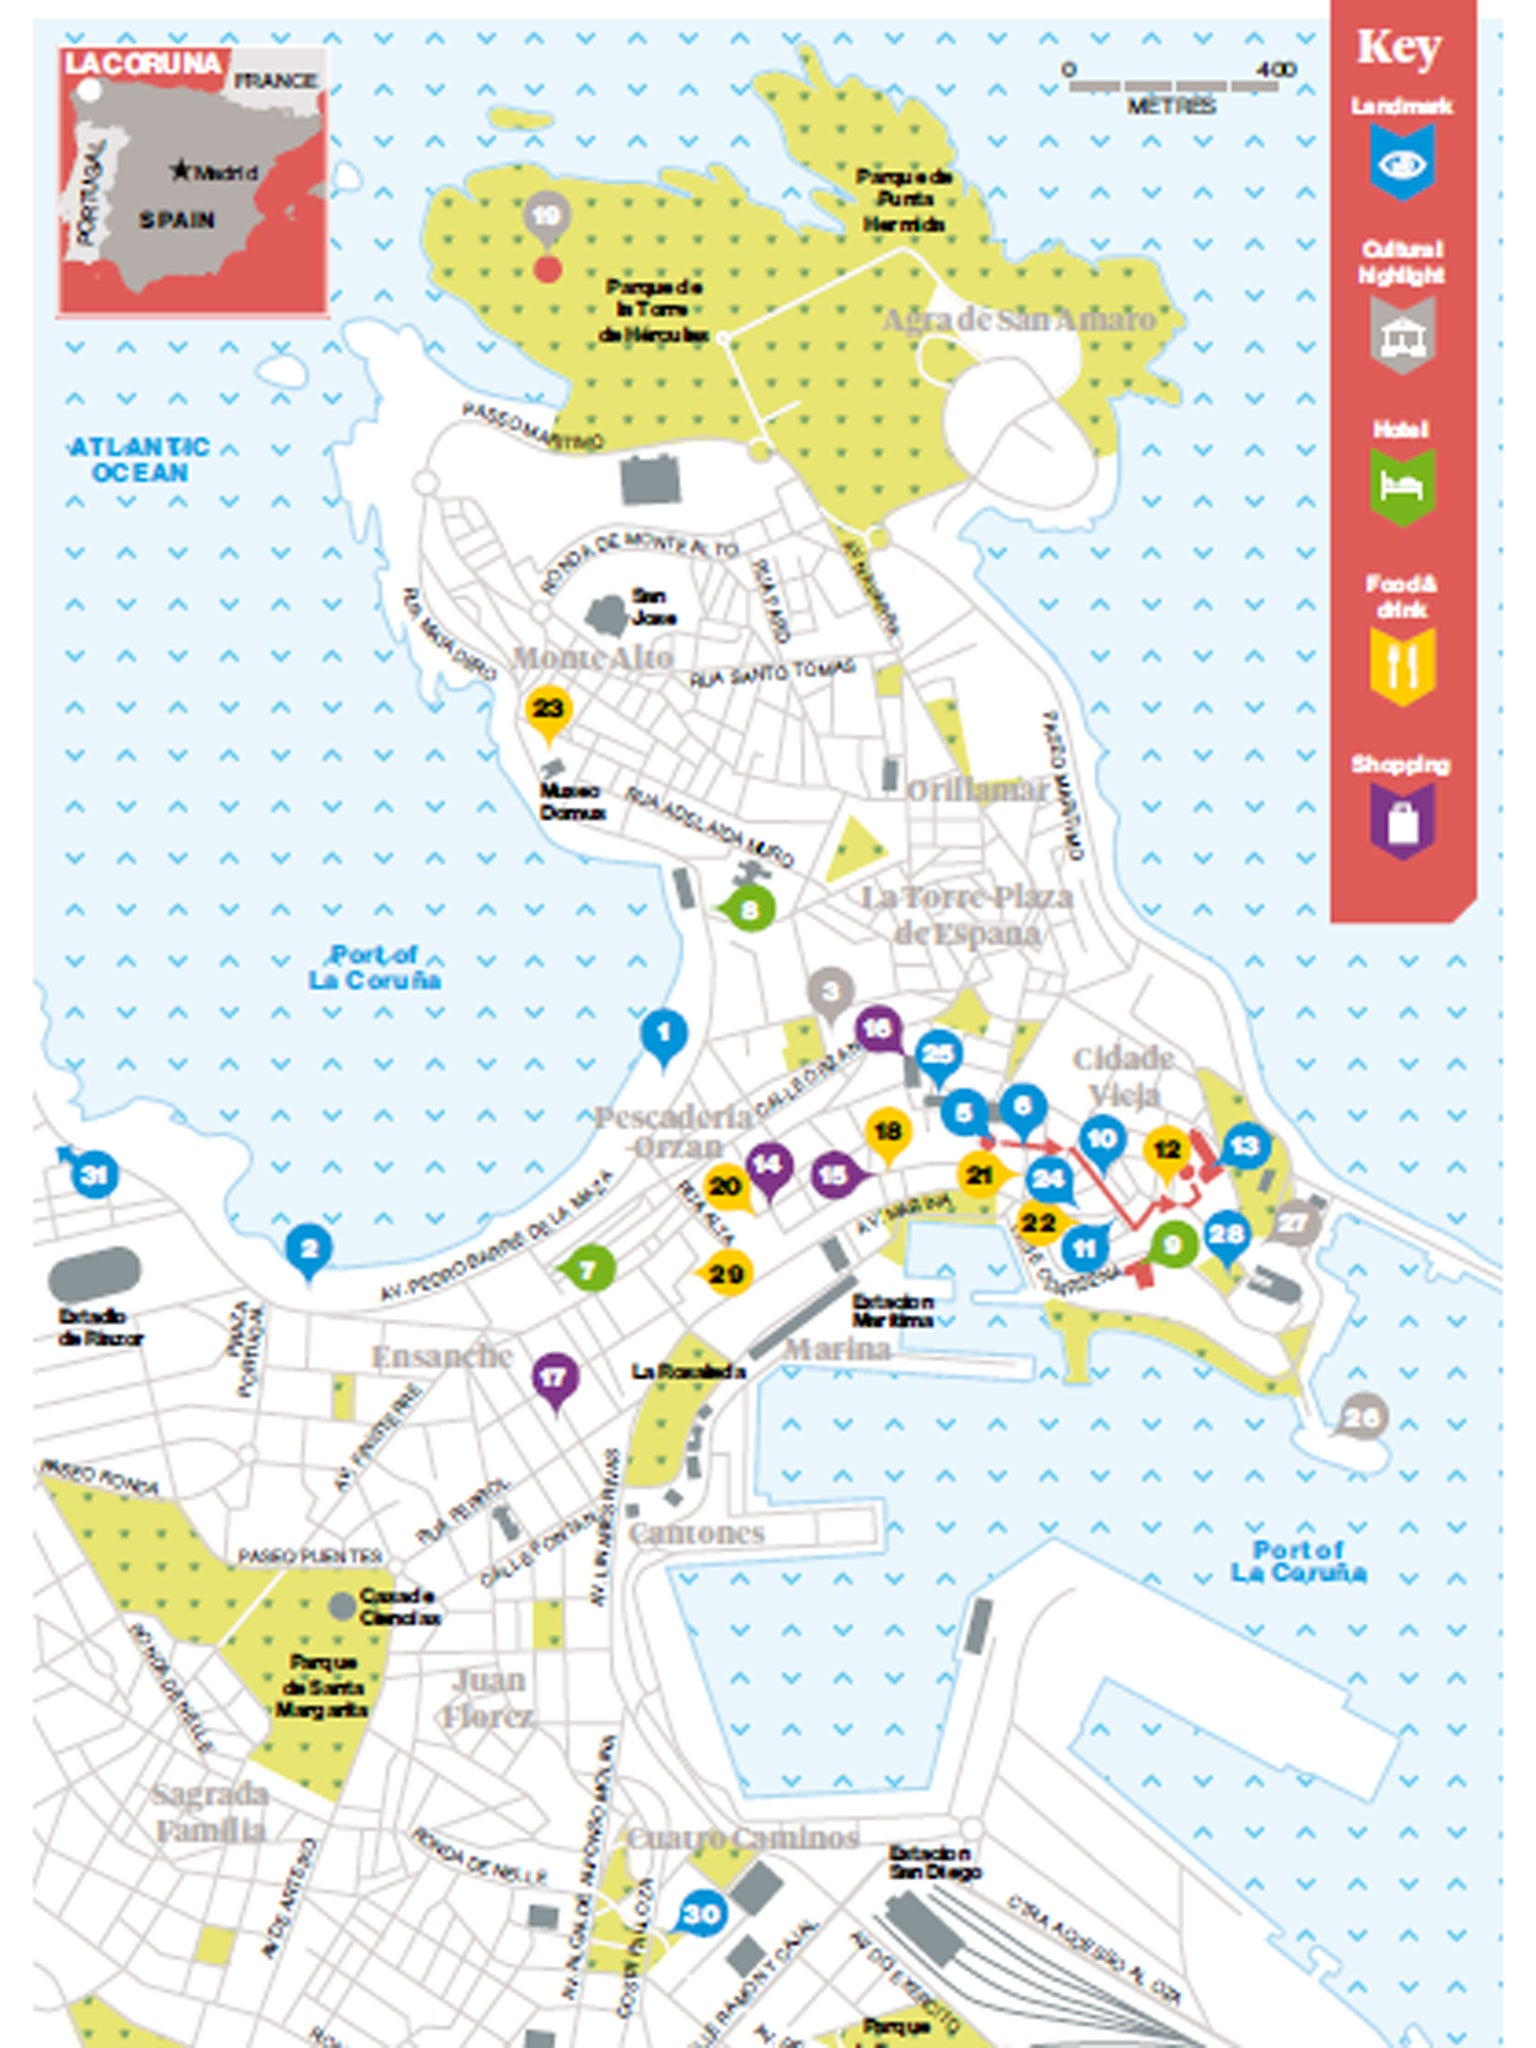 Map Of Spain La Coruna.48 Hours In La Coruna The Independent